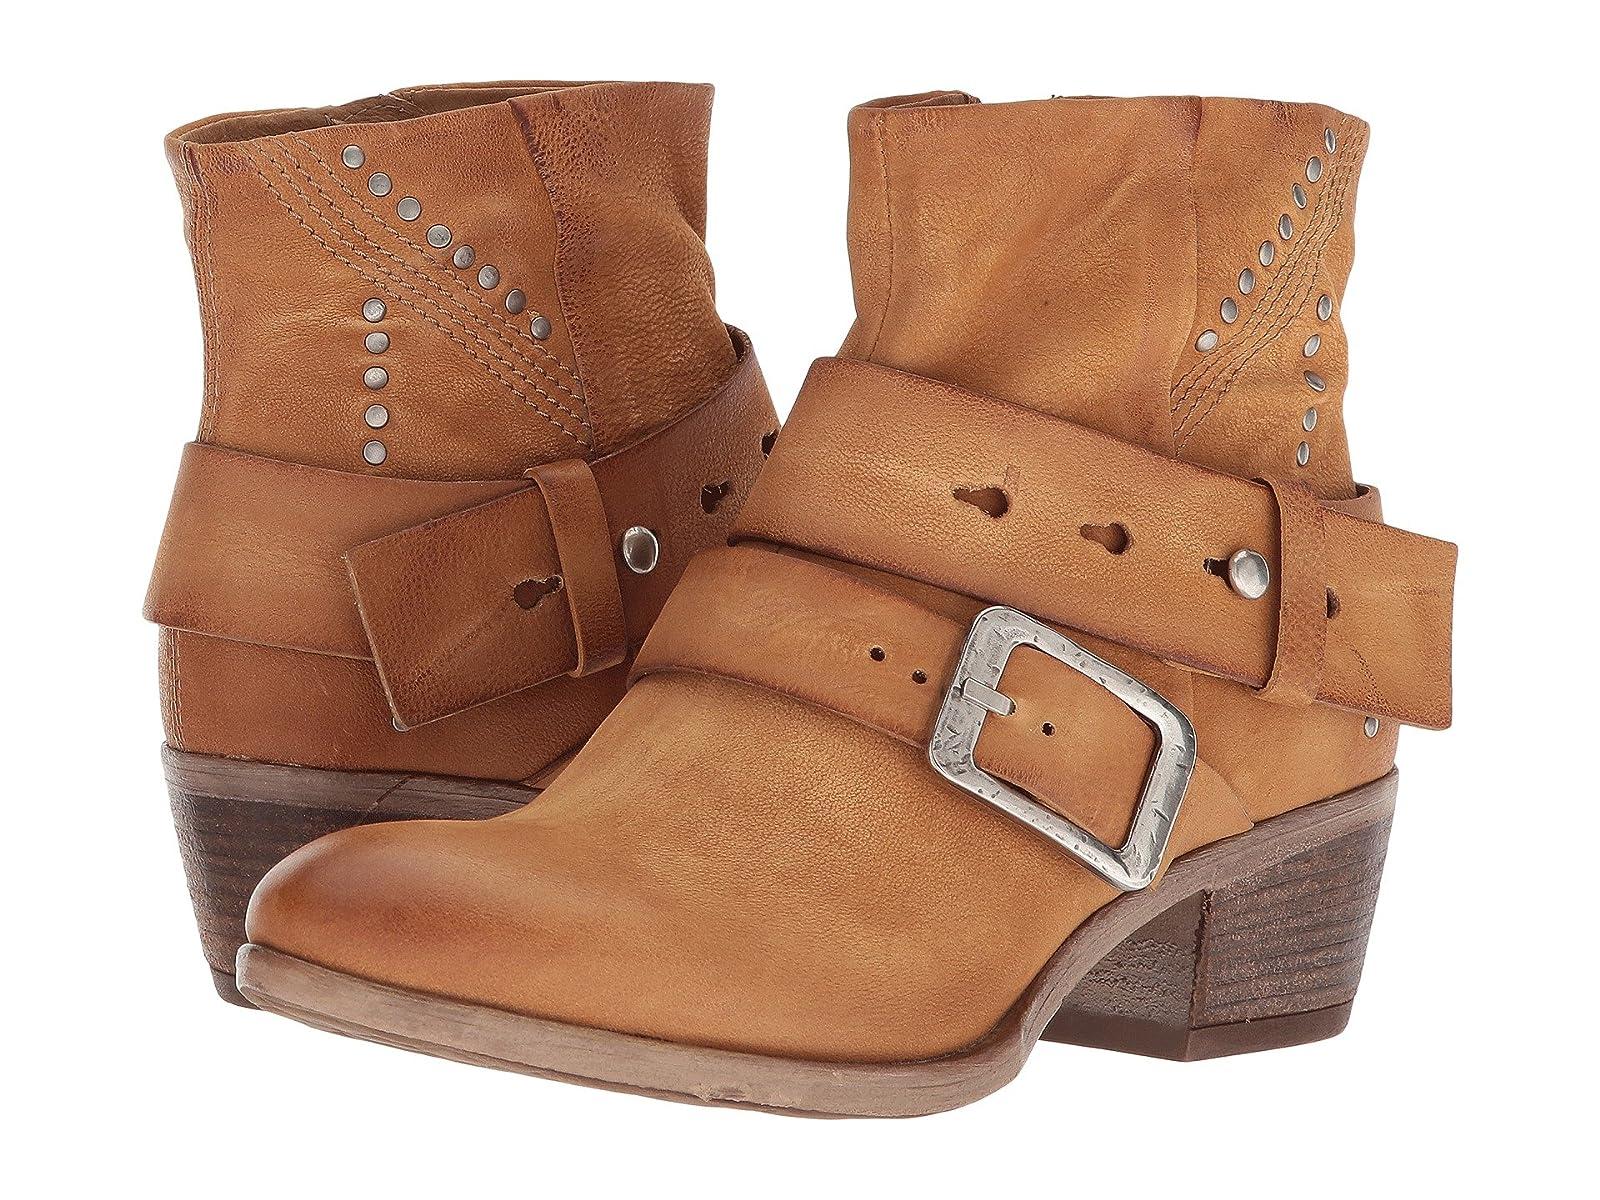 Miz Mooz DaisyCheap and distinctive eye-catching shoes